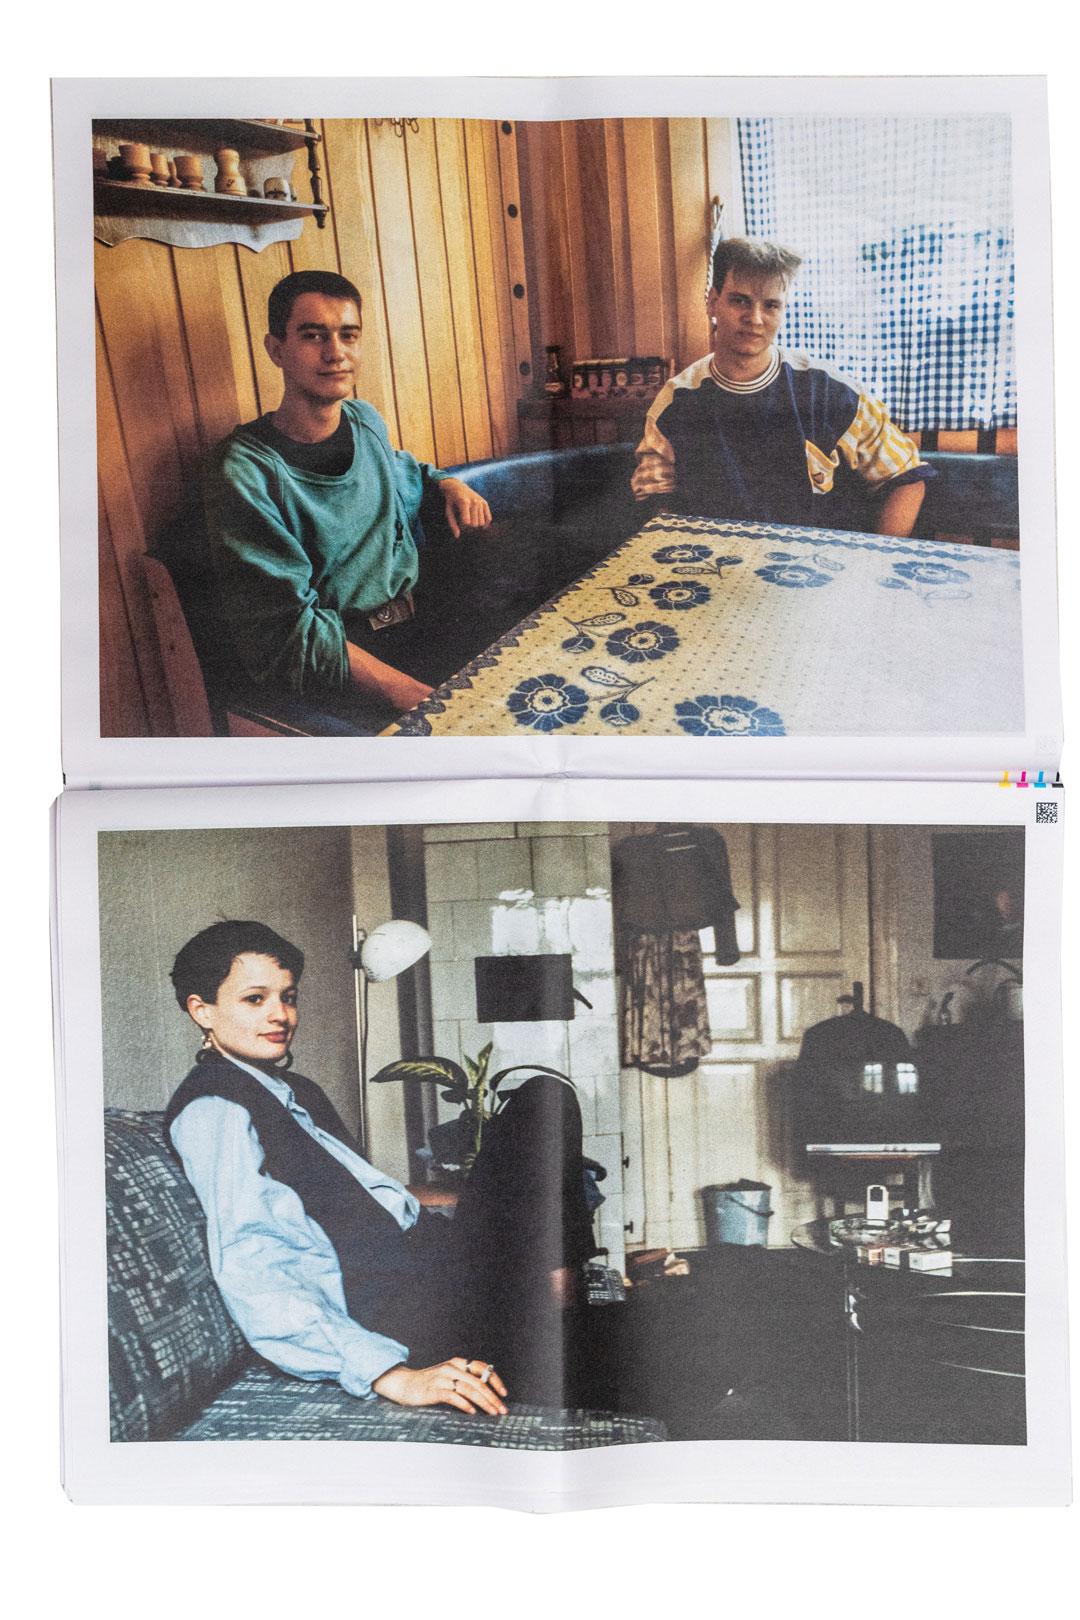 hands-on-papers-Huma-Rosentalski-1990DDR-3